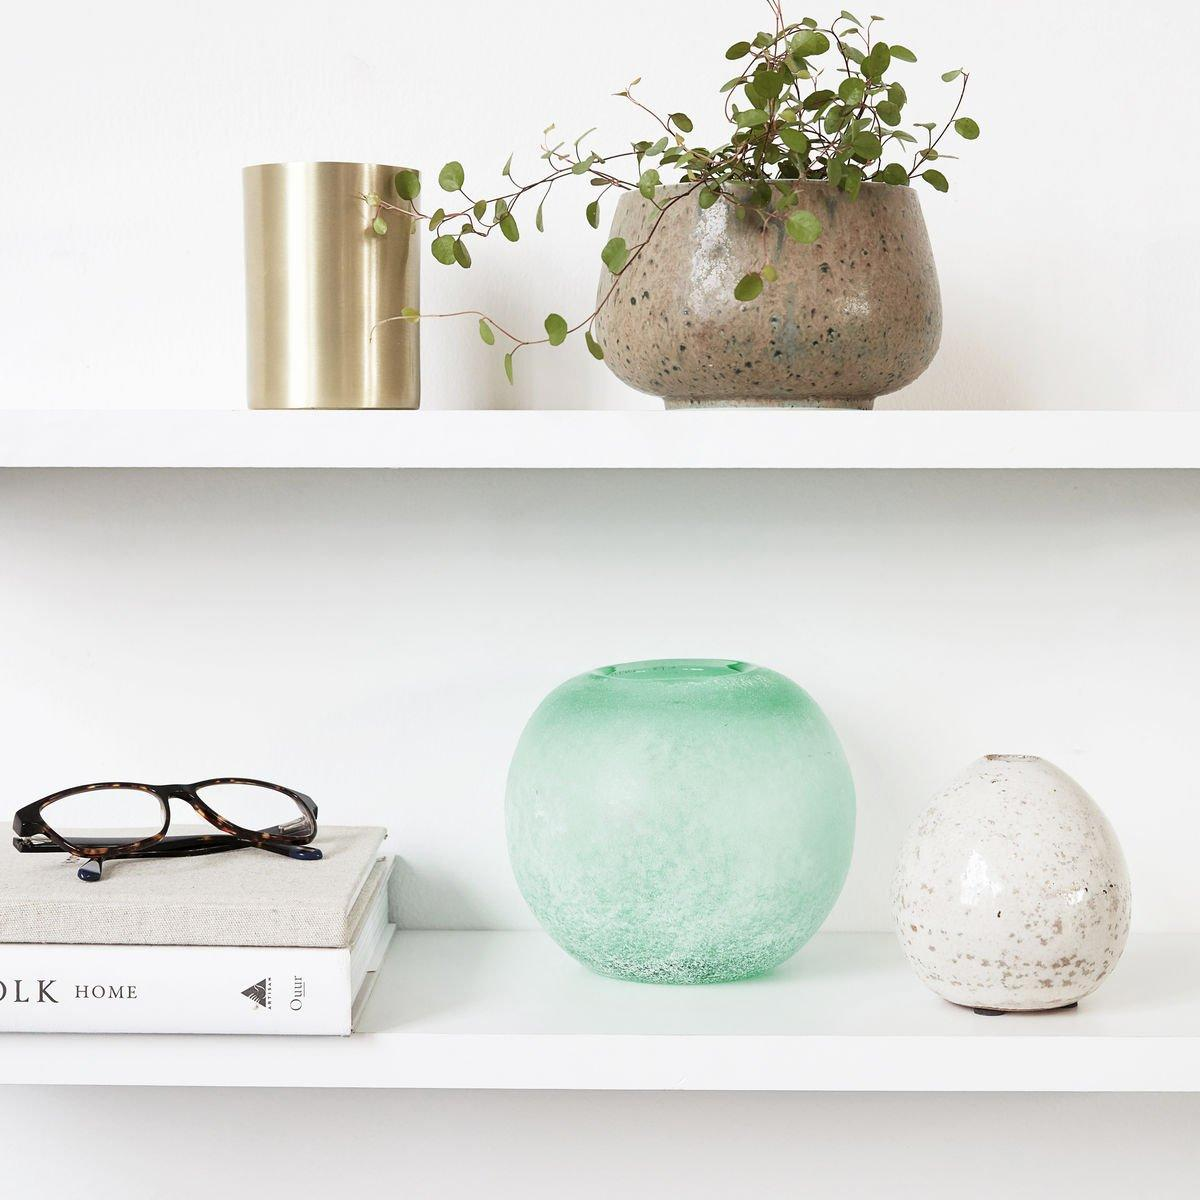 Sada 2 ks − Zelená váza RD